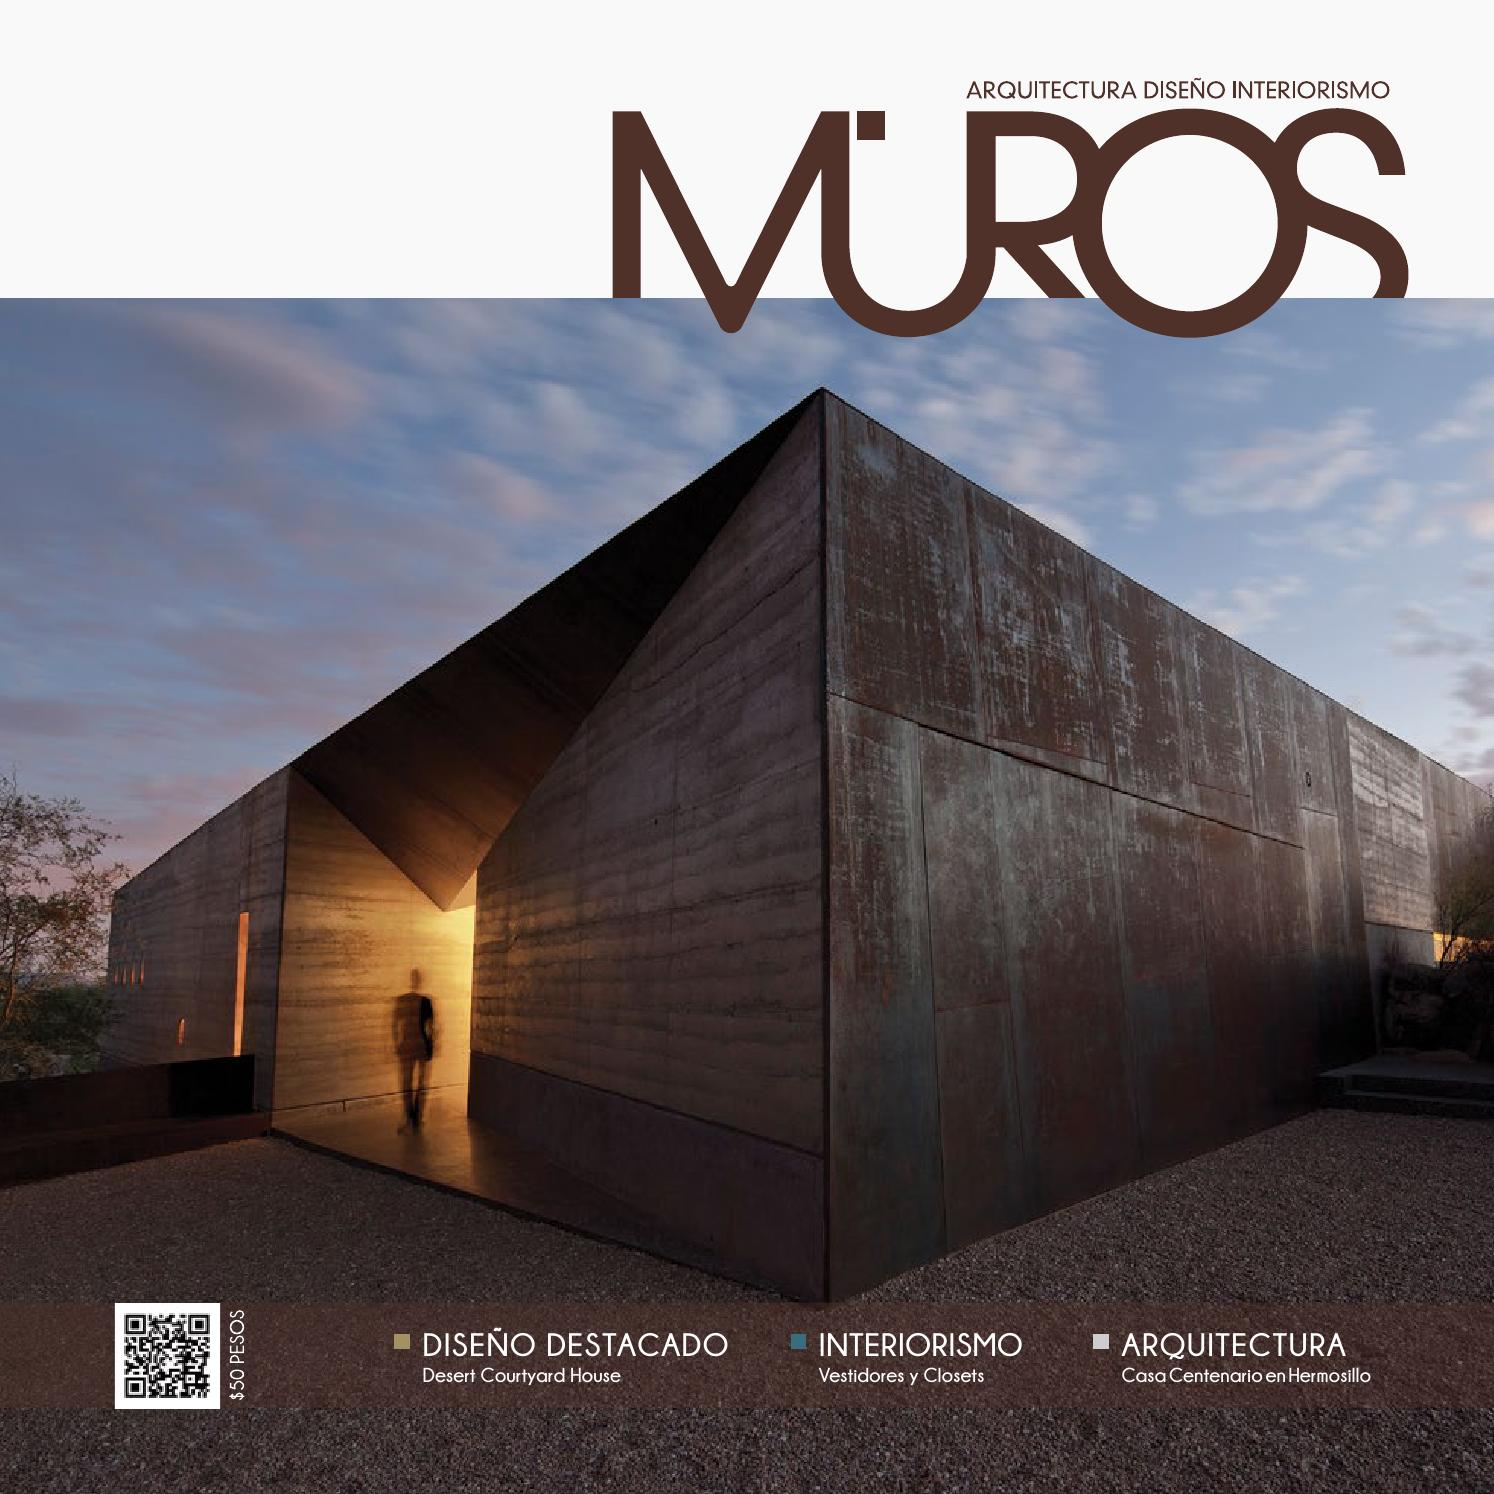 Edici n 16 revista muros arquitectura dise o for Arte arquitectura y diseno definicion